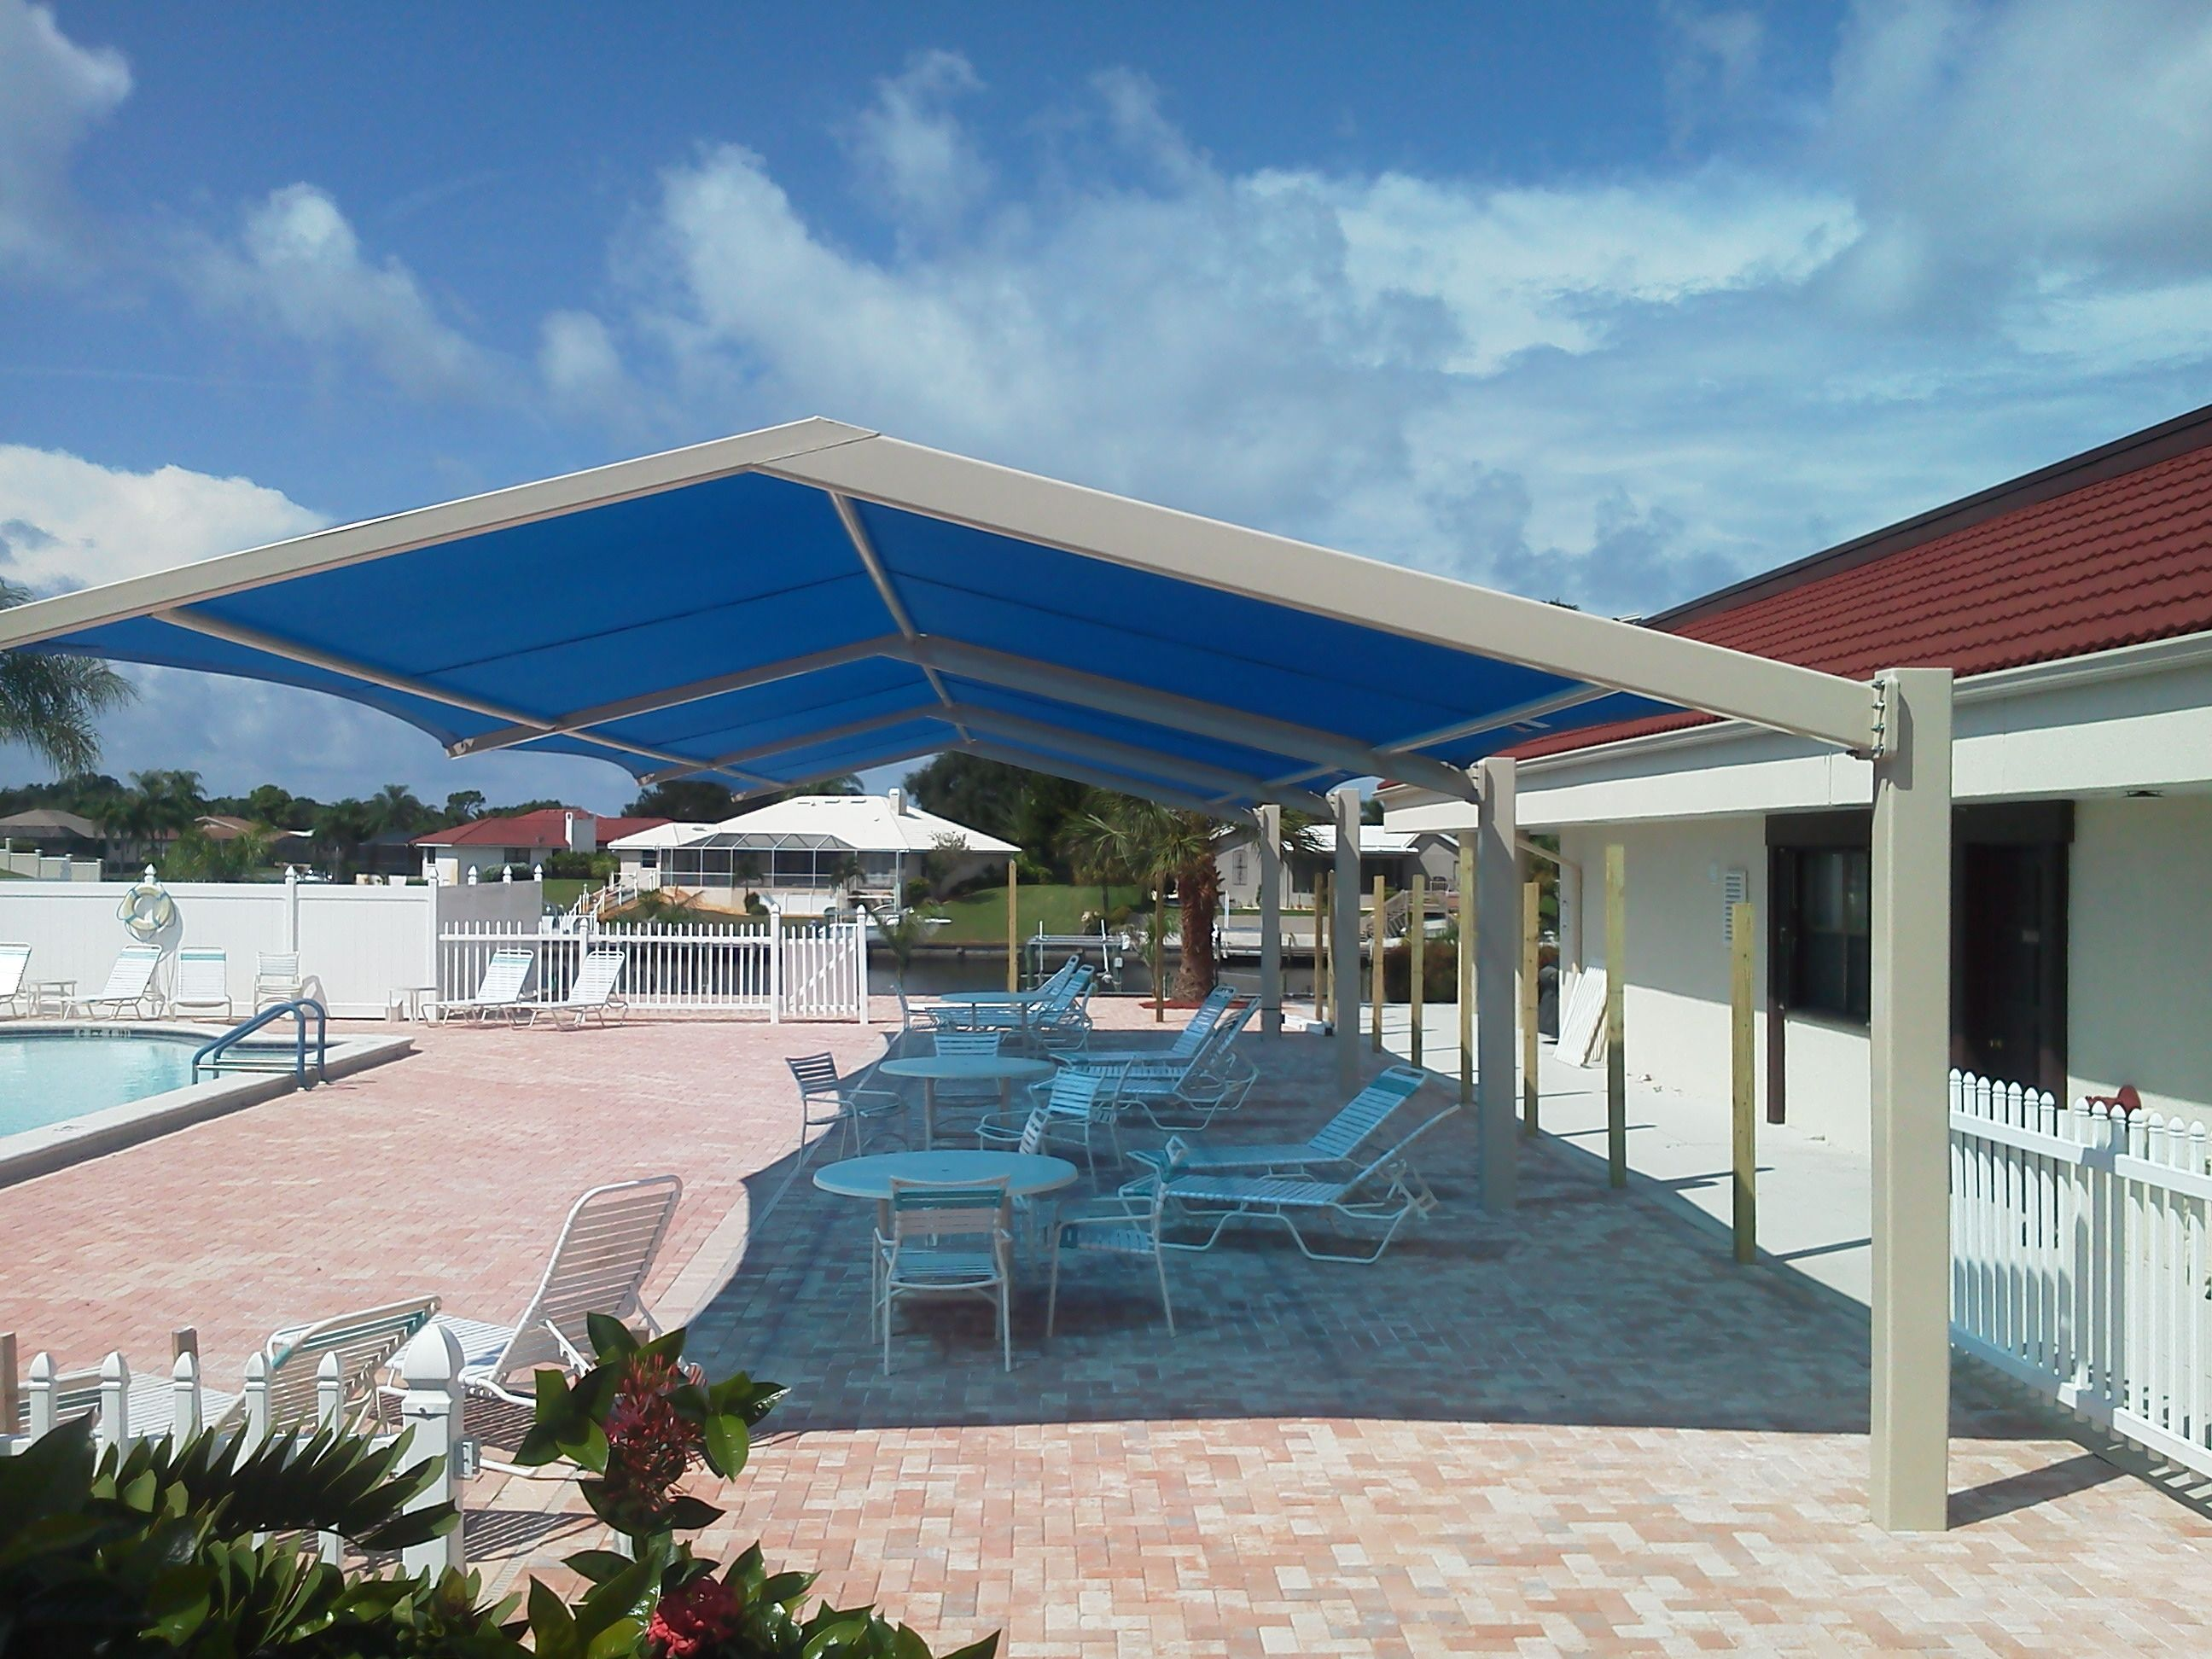 Apollo Sunguard Cantilever Pool Shade Custom Shades Structure